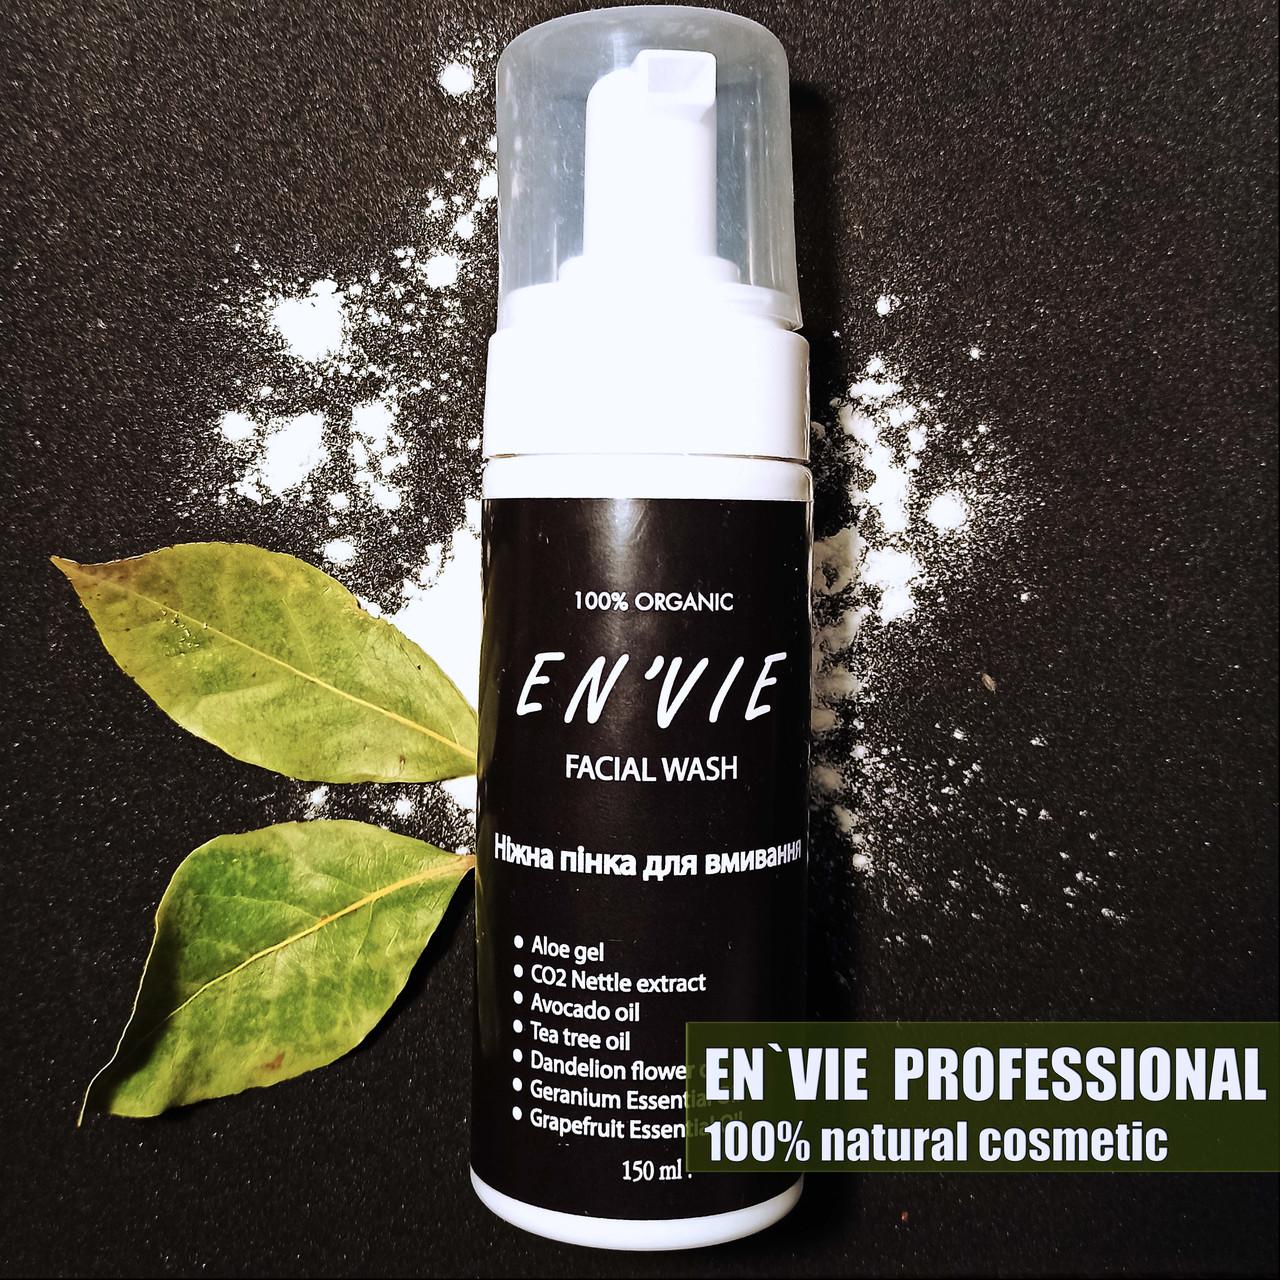 Пенка для умывания лица профессиональная натуральная 150 мл. Envie Cosmetic